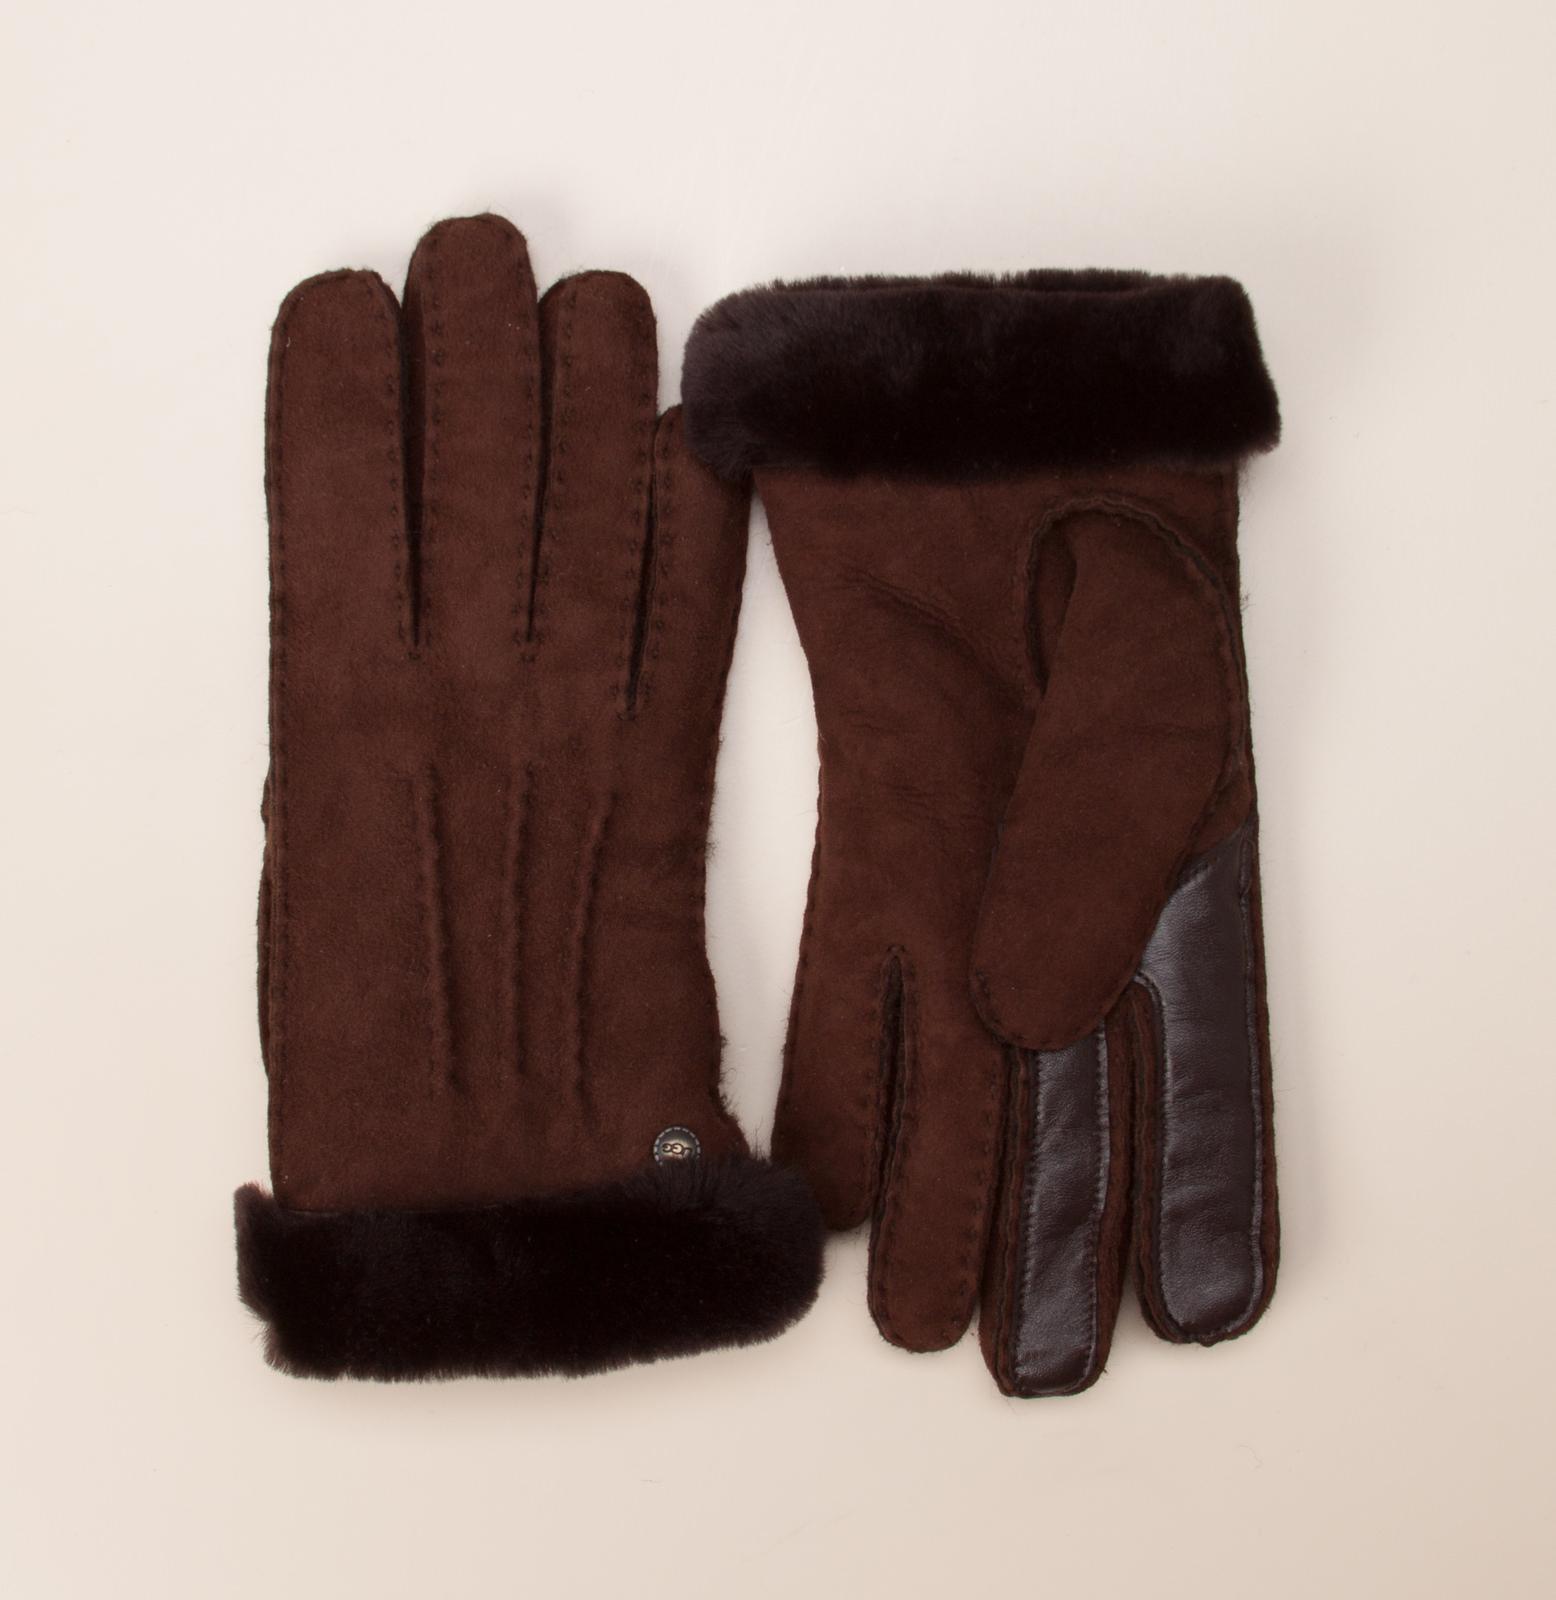 ugg damen acces damen handschuhe in dunkelbraun kaufen zumnorde online shop. Black Bedroom Furniture Sets. Home Design Ideas